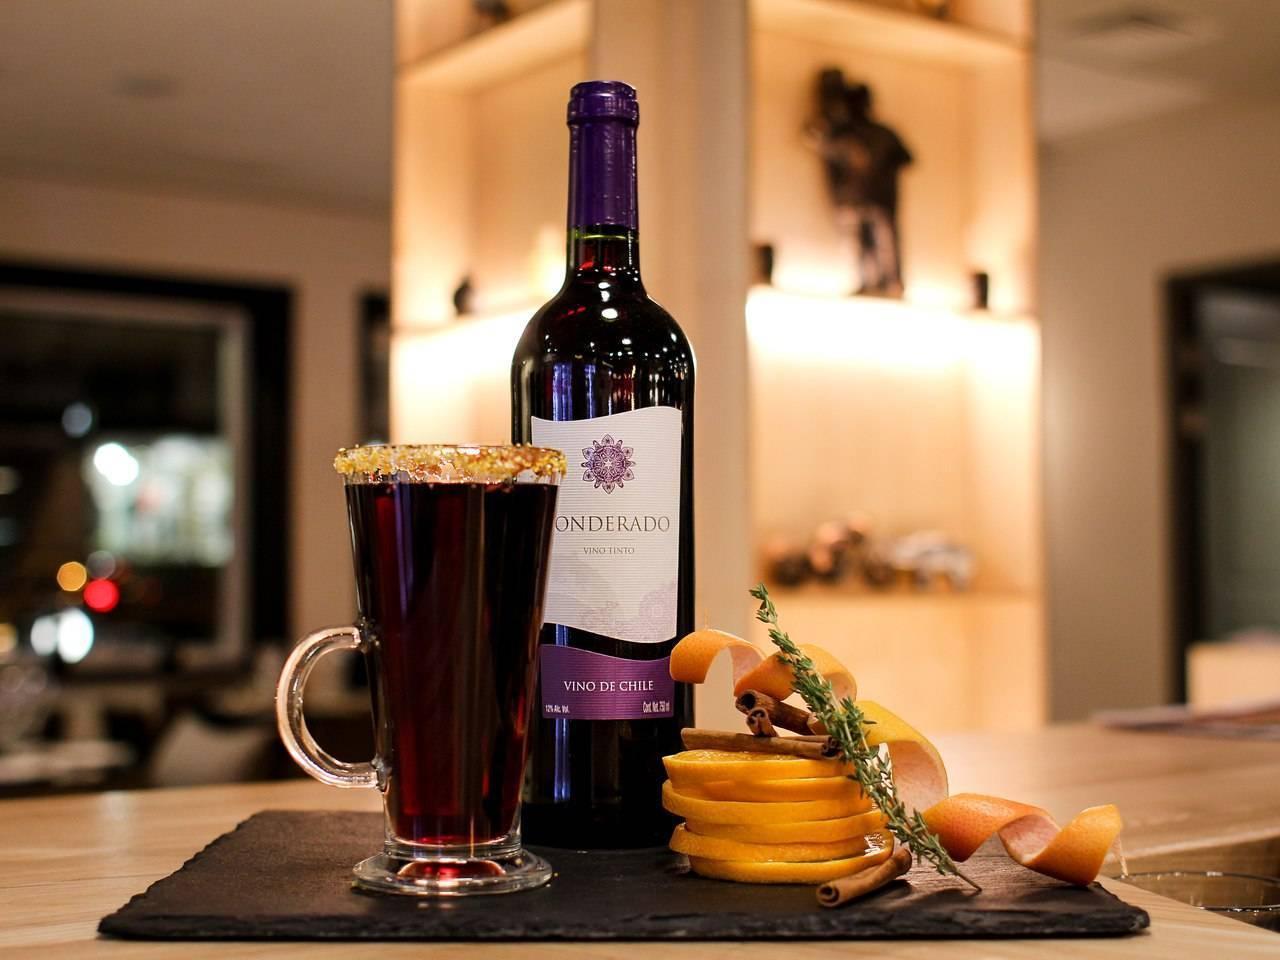 Глинтвейн в домашних условиях: без алкоголя, из белого и красного вина